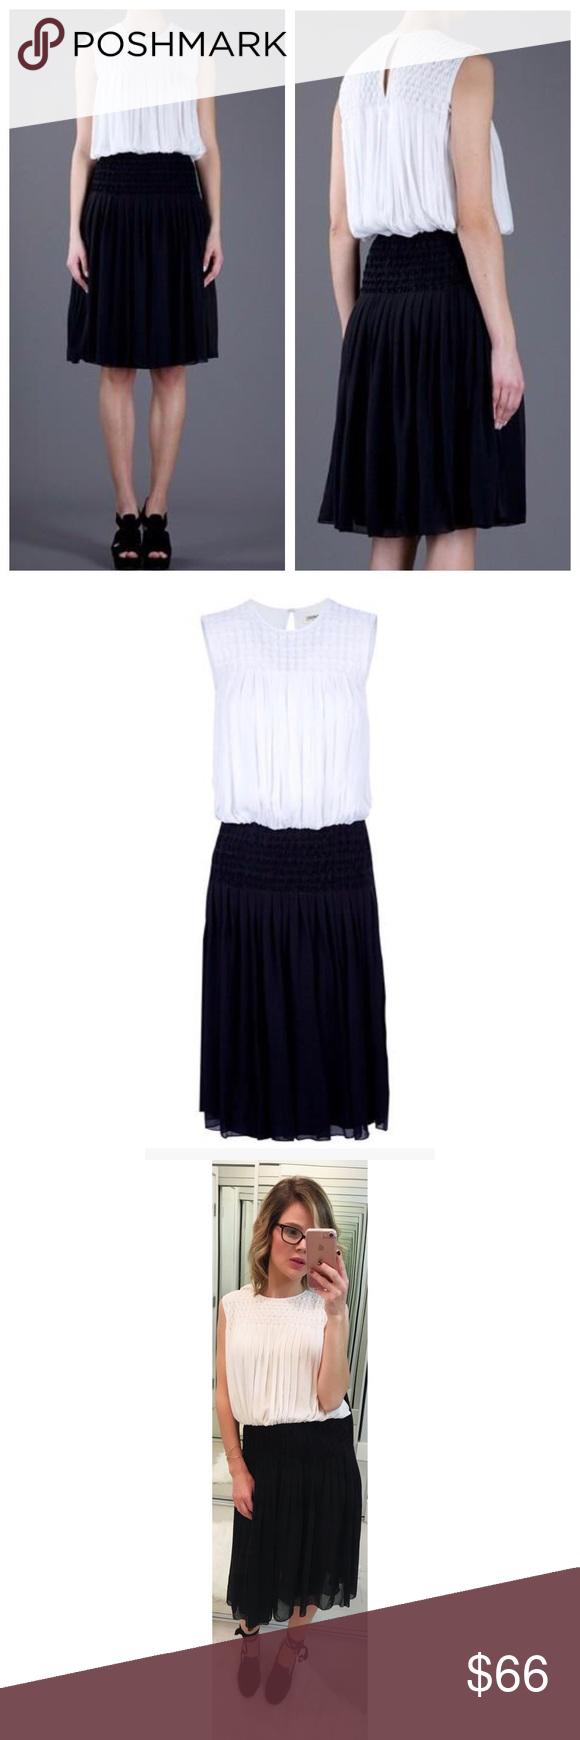 Luagence black diamond pleat dress black sleeveless silk dress from